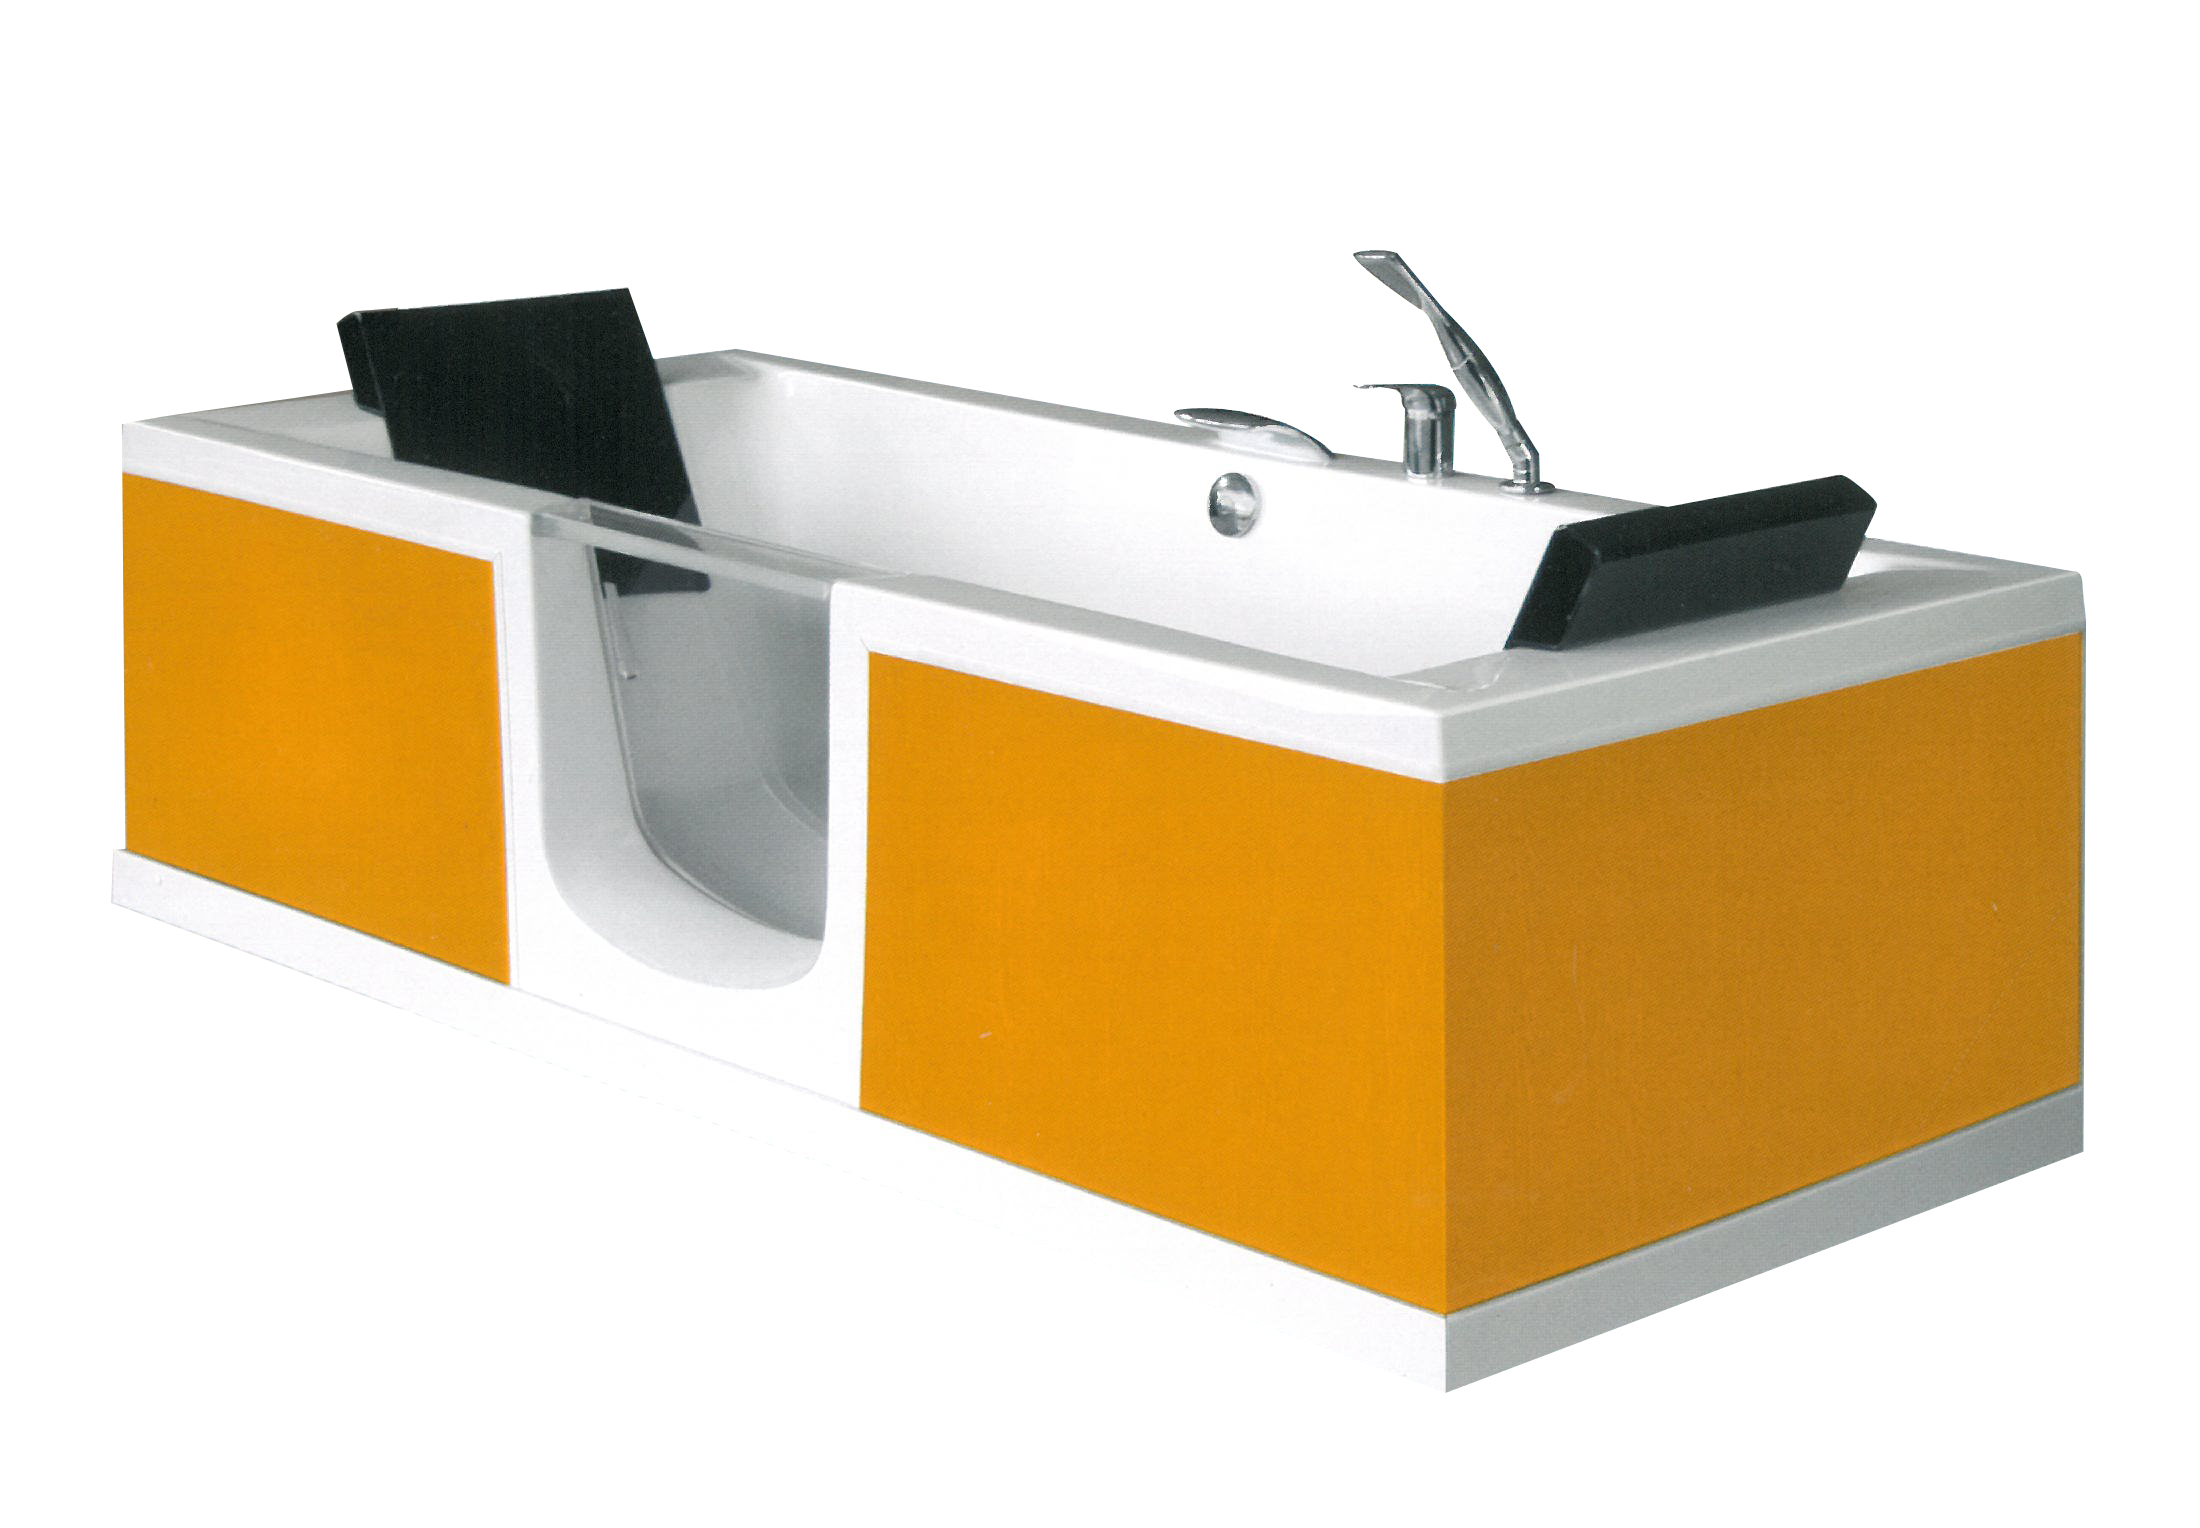 La baignoire porte belle ile un bain en position allong e for Baignoire a porte prix